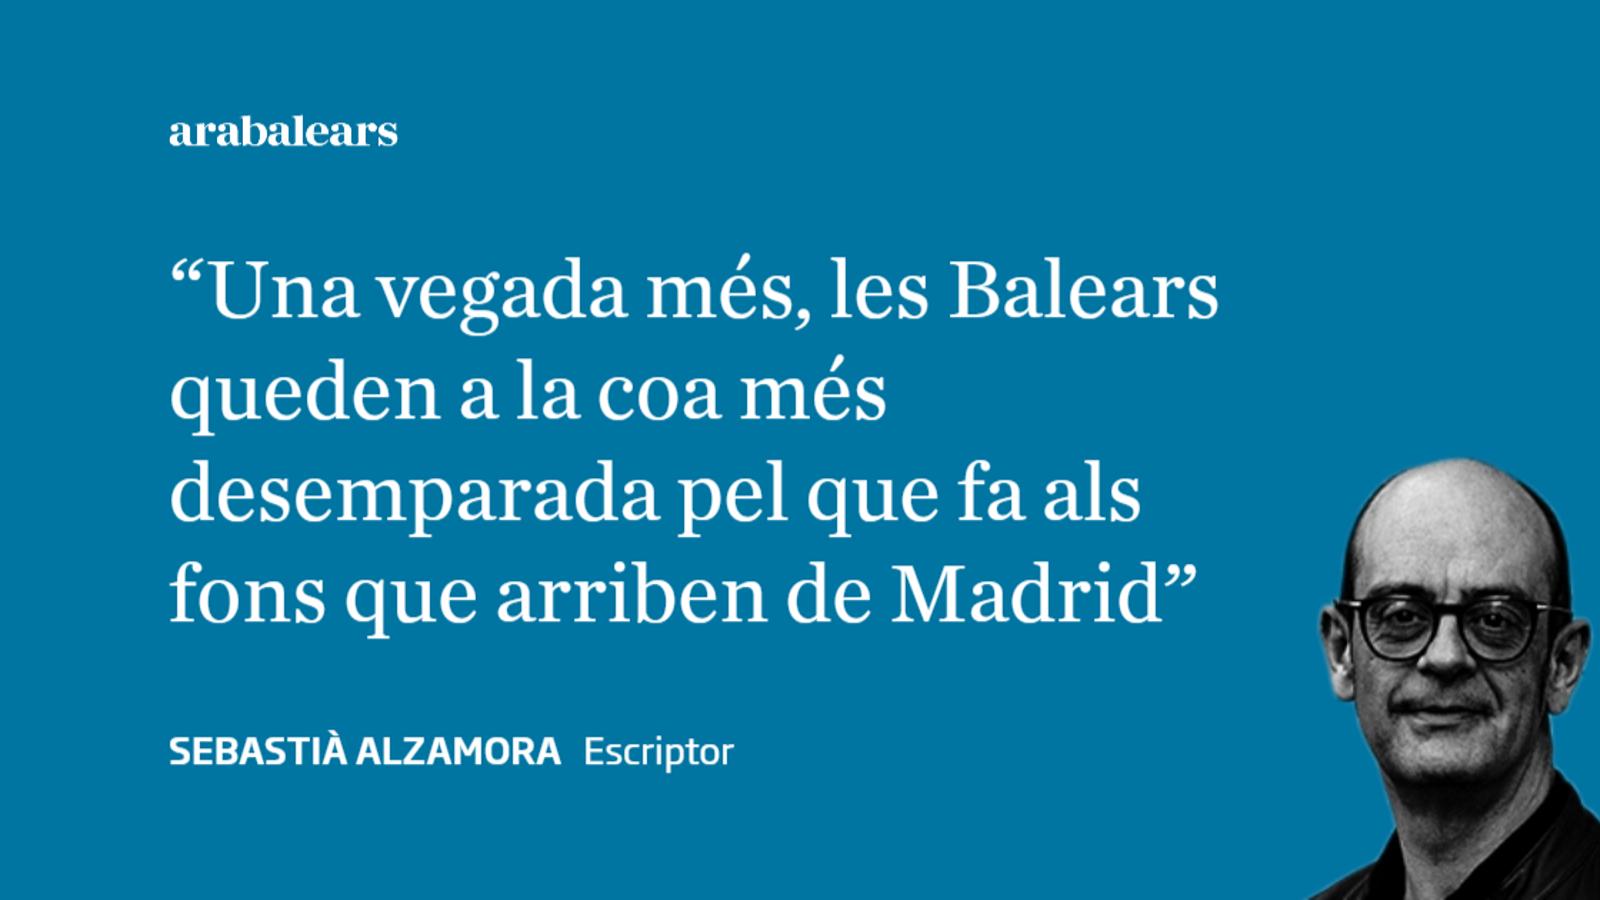 Espanyolistes de Balears, enhorabona